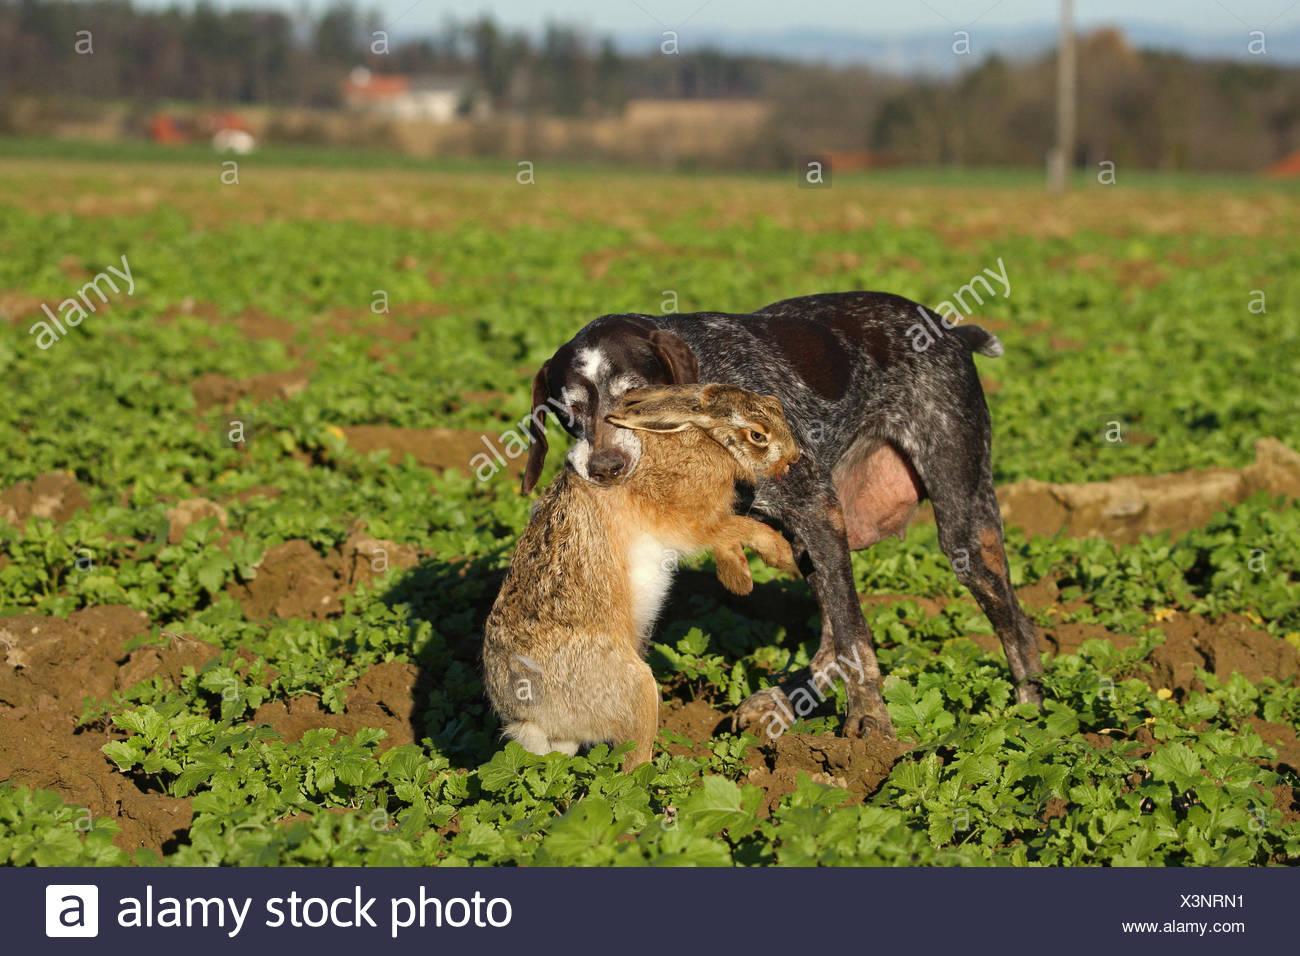 German Shorthaired Pointer, hunting dog retrieving European hare (Lepus europaeus), Lower Austria, Austria - Stock Image